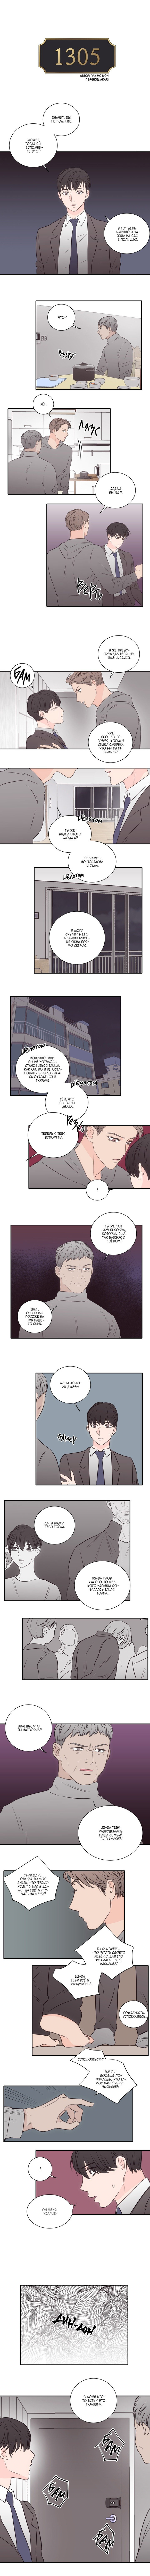 Манга 1305 - Глава 39 Страница 1